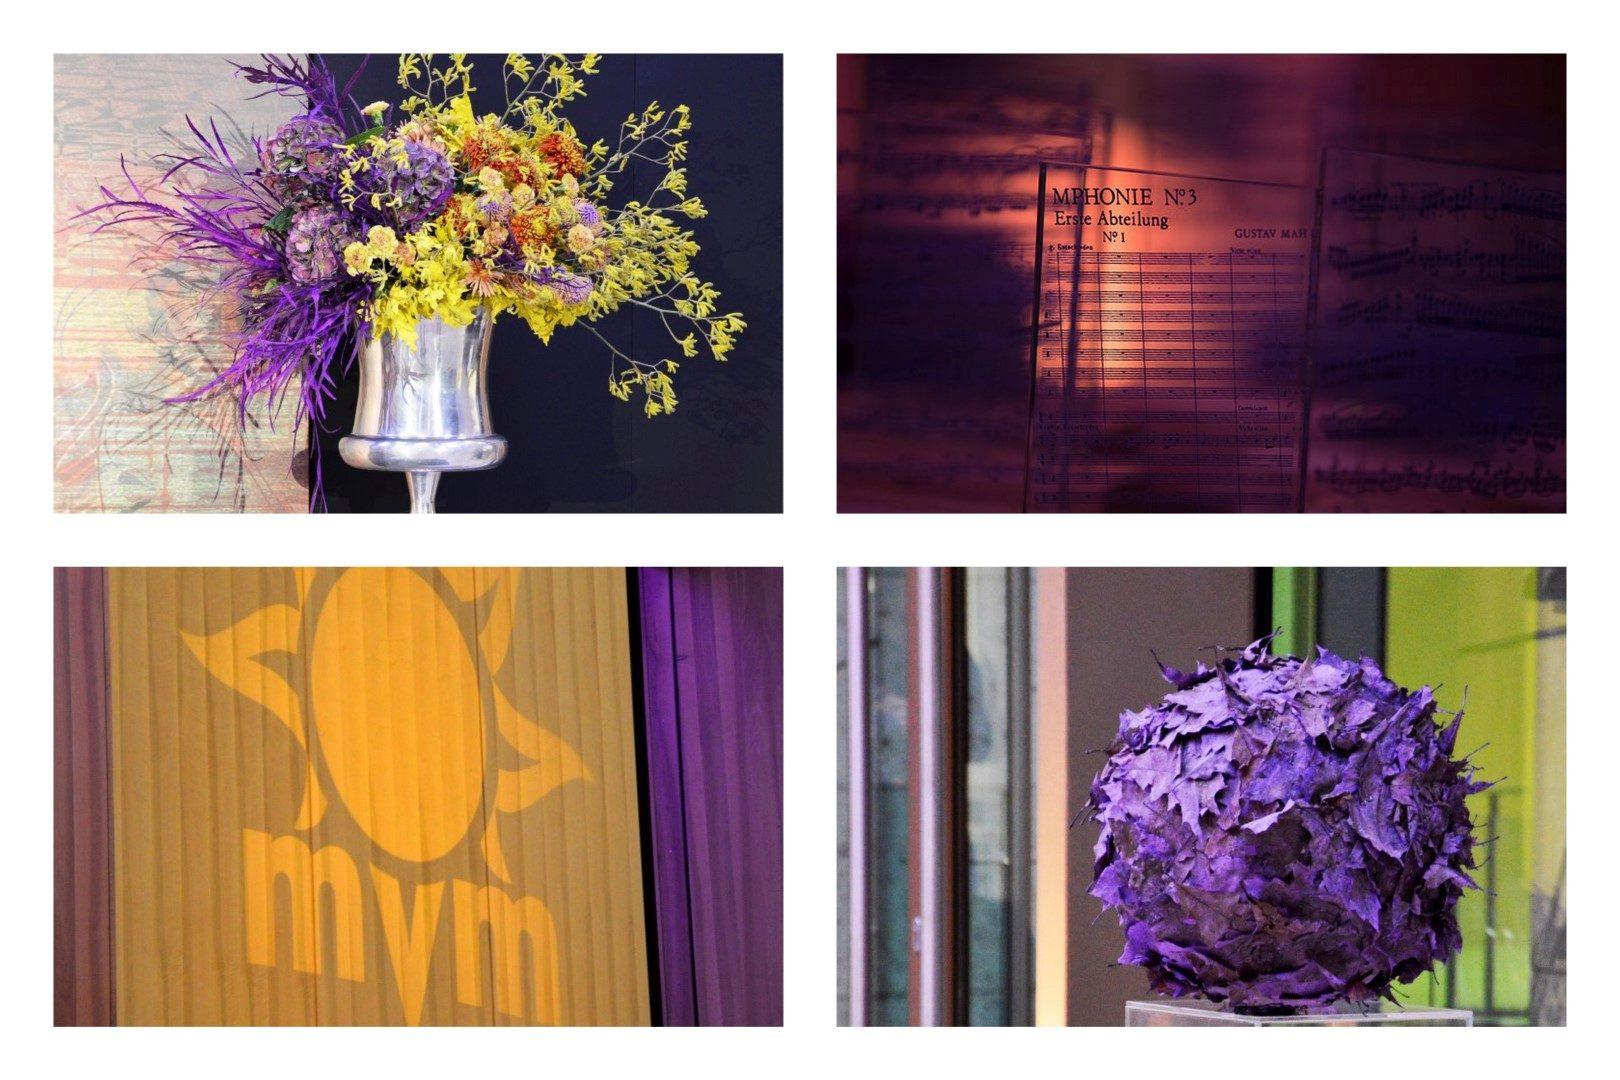 ,junior prima,dekoráció,junior prima dekoráció,rendezvény dekorációk,rendezvény dekor,dekor,dekoratőr,dekoratőr,esküvő,junior prima díj,junior prima 2015,gyenes szilvi,